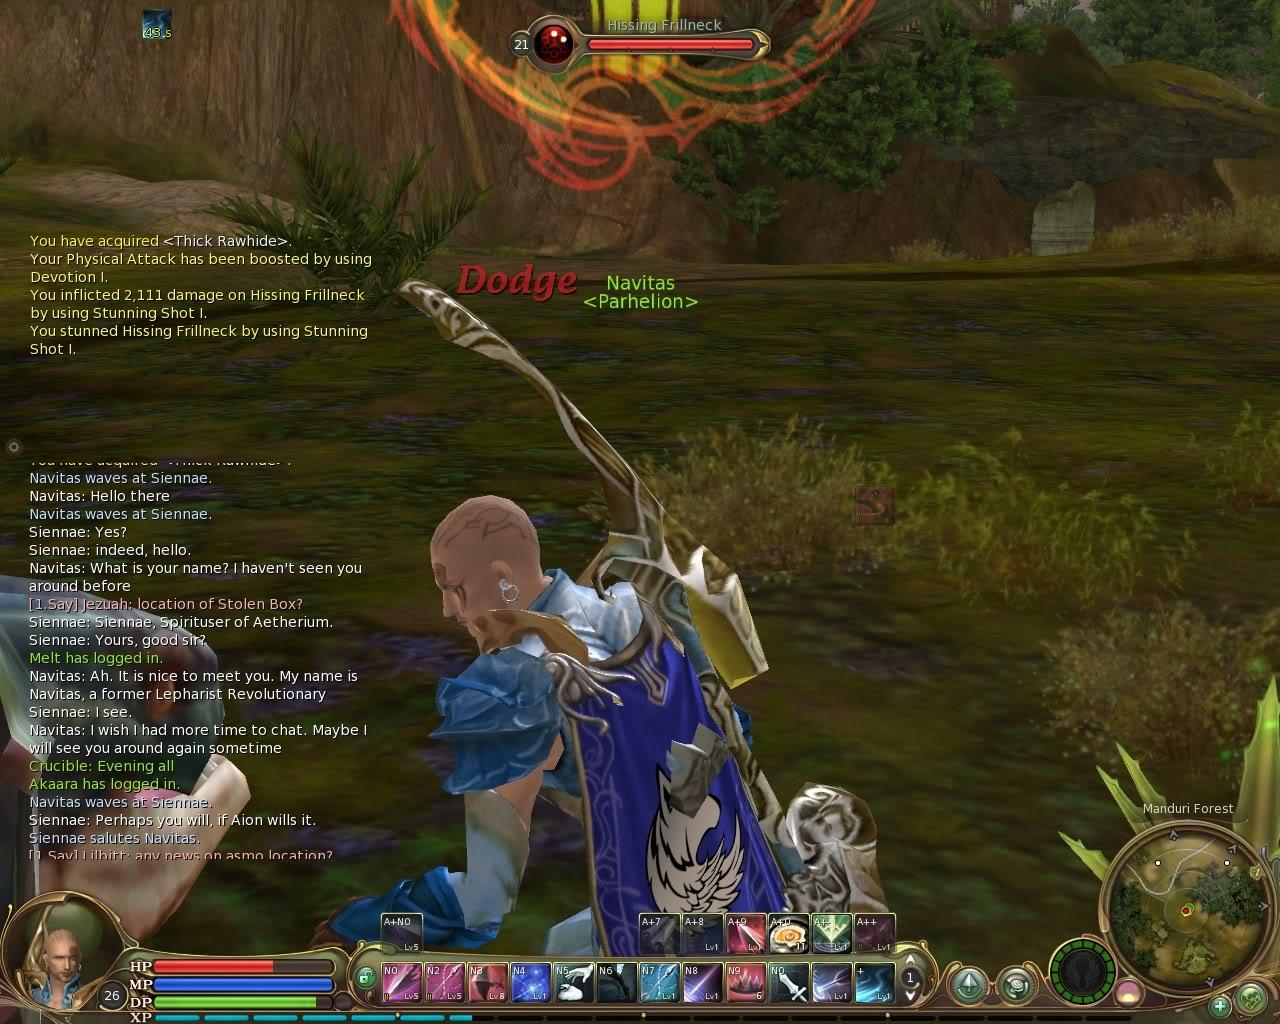 Aetherium: Our RP-Friendly Friends Aion0002